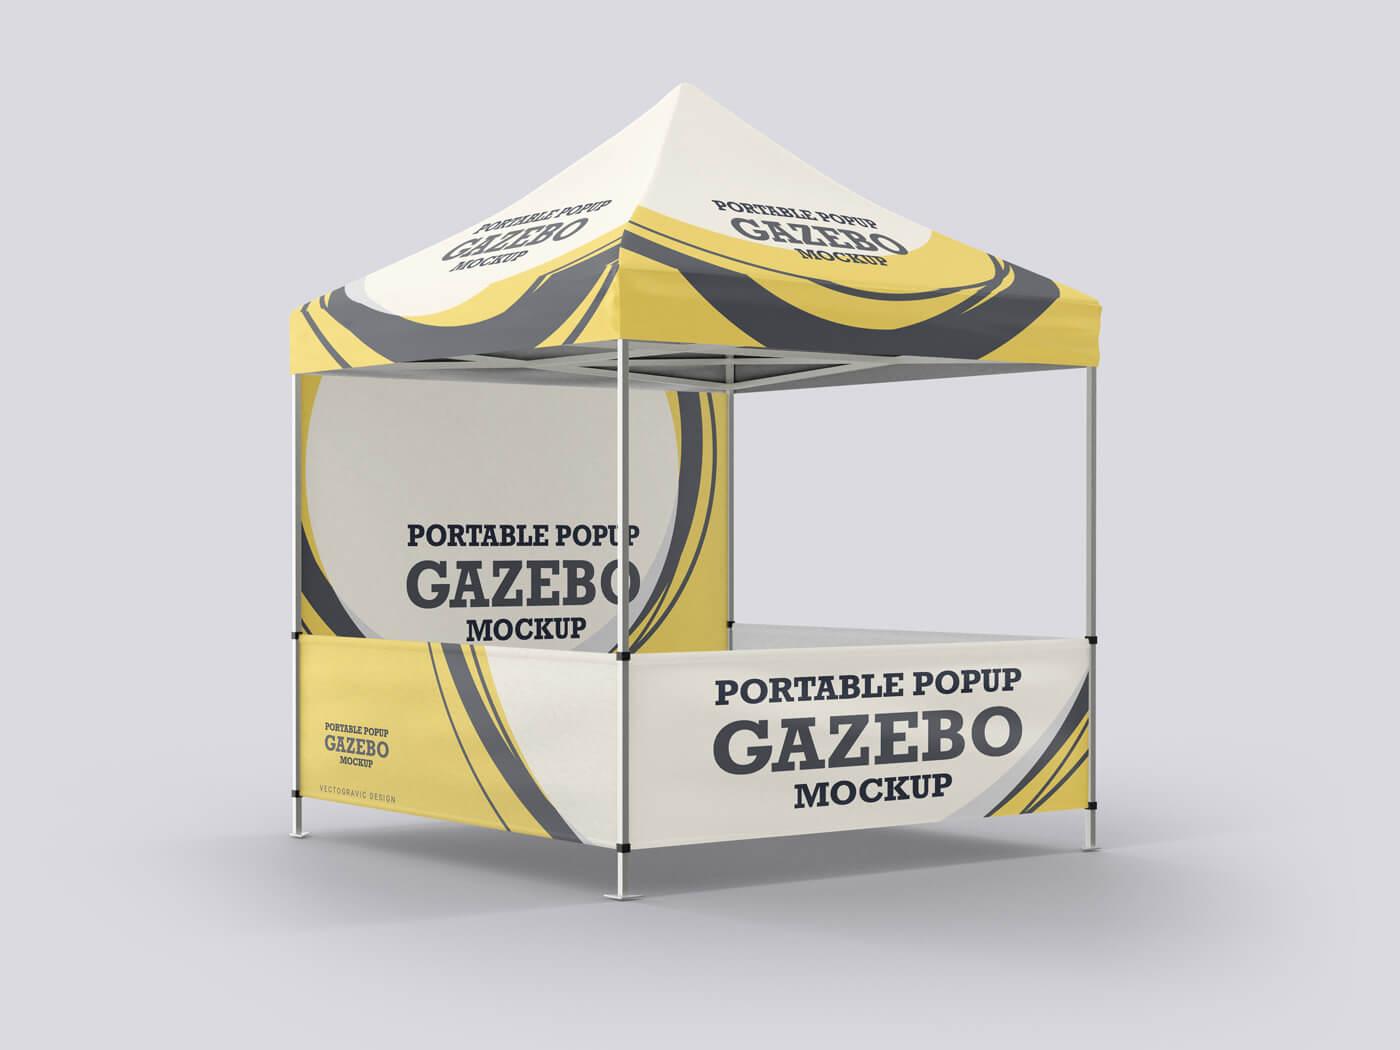 Portable Pop Up Gazebo Mockup